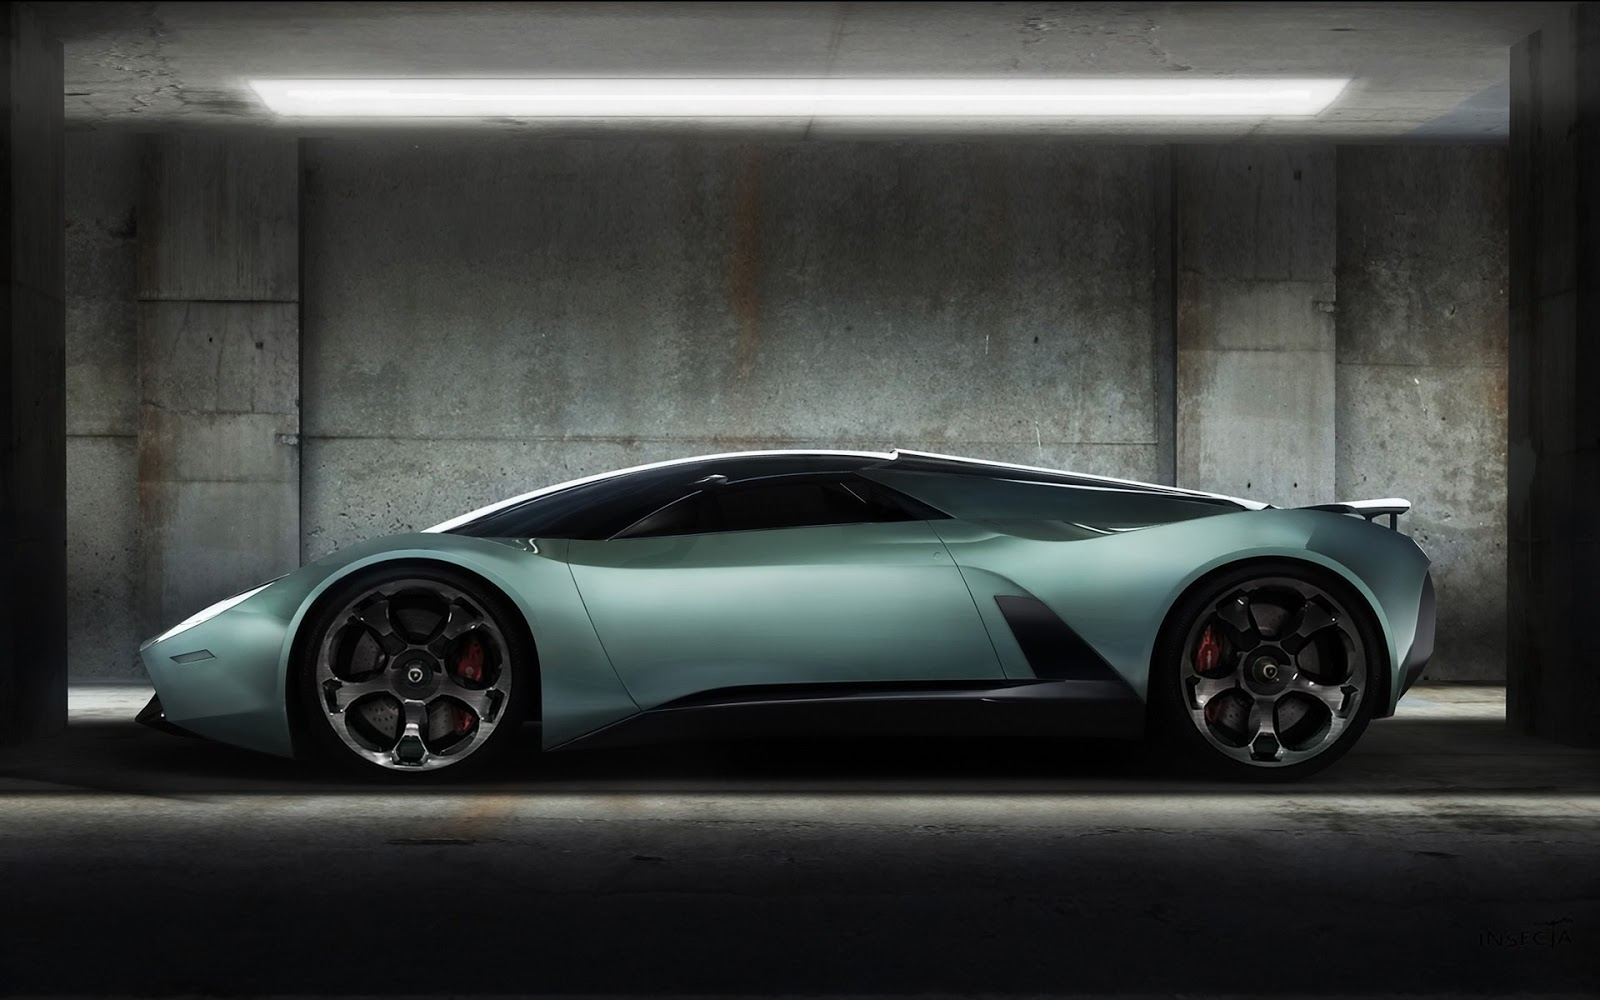 Lamborghini Insecta Concept Wallpaper Lamborghini Cars